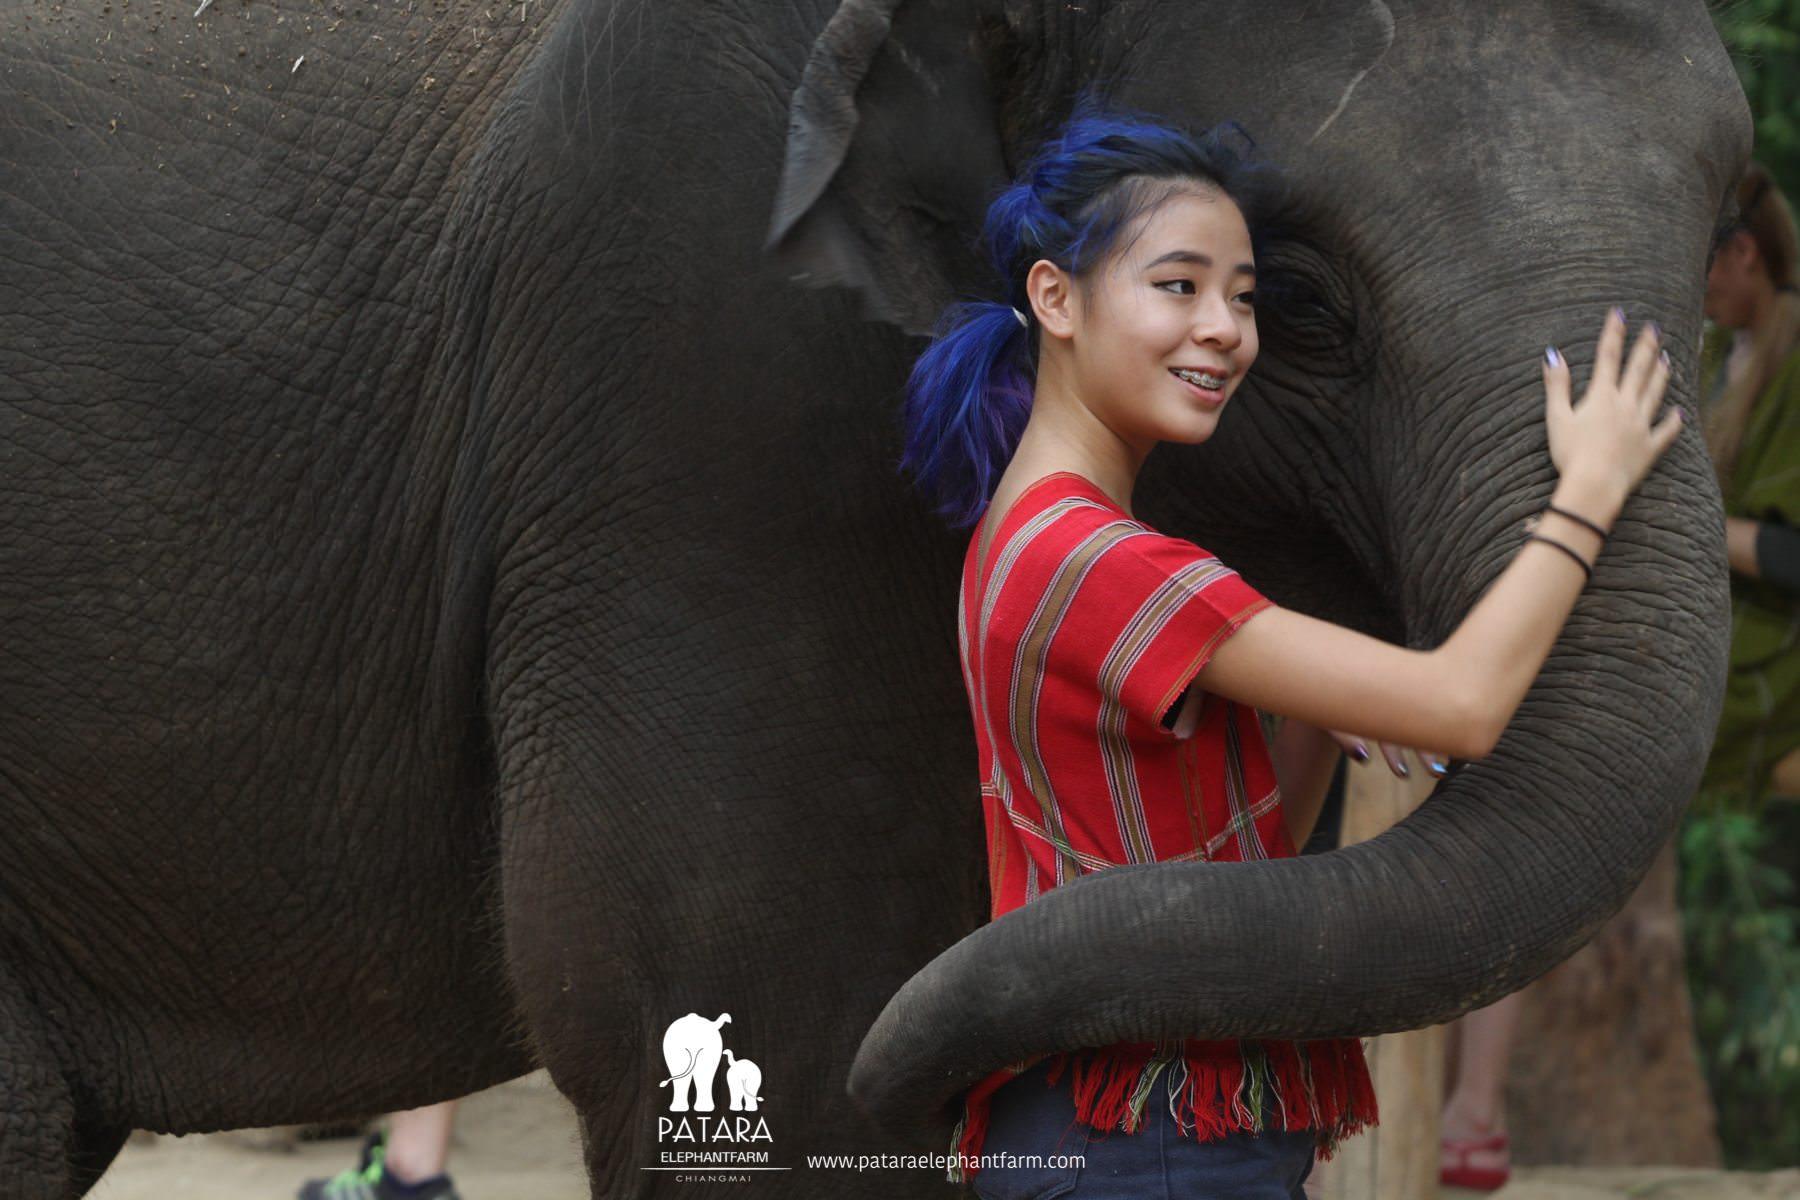 PataraElephantFarm-ChiangMai-Hugs